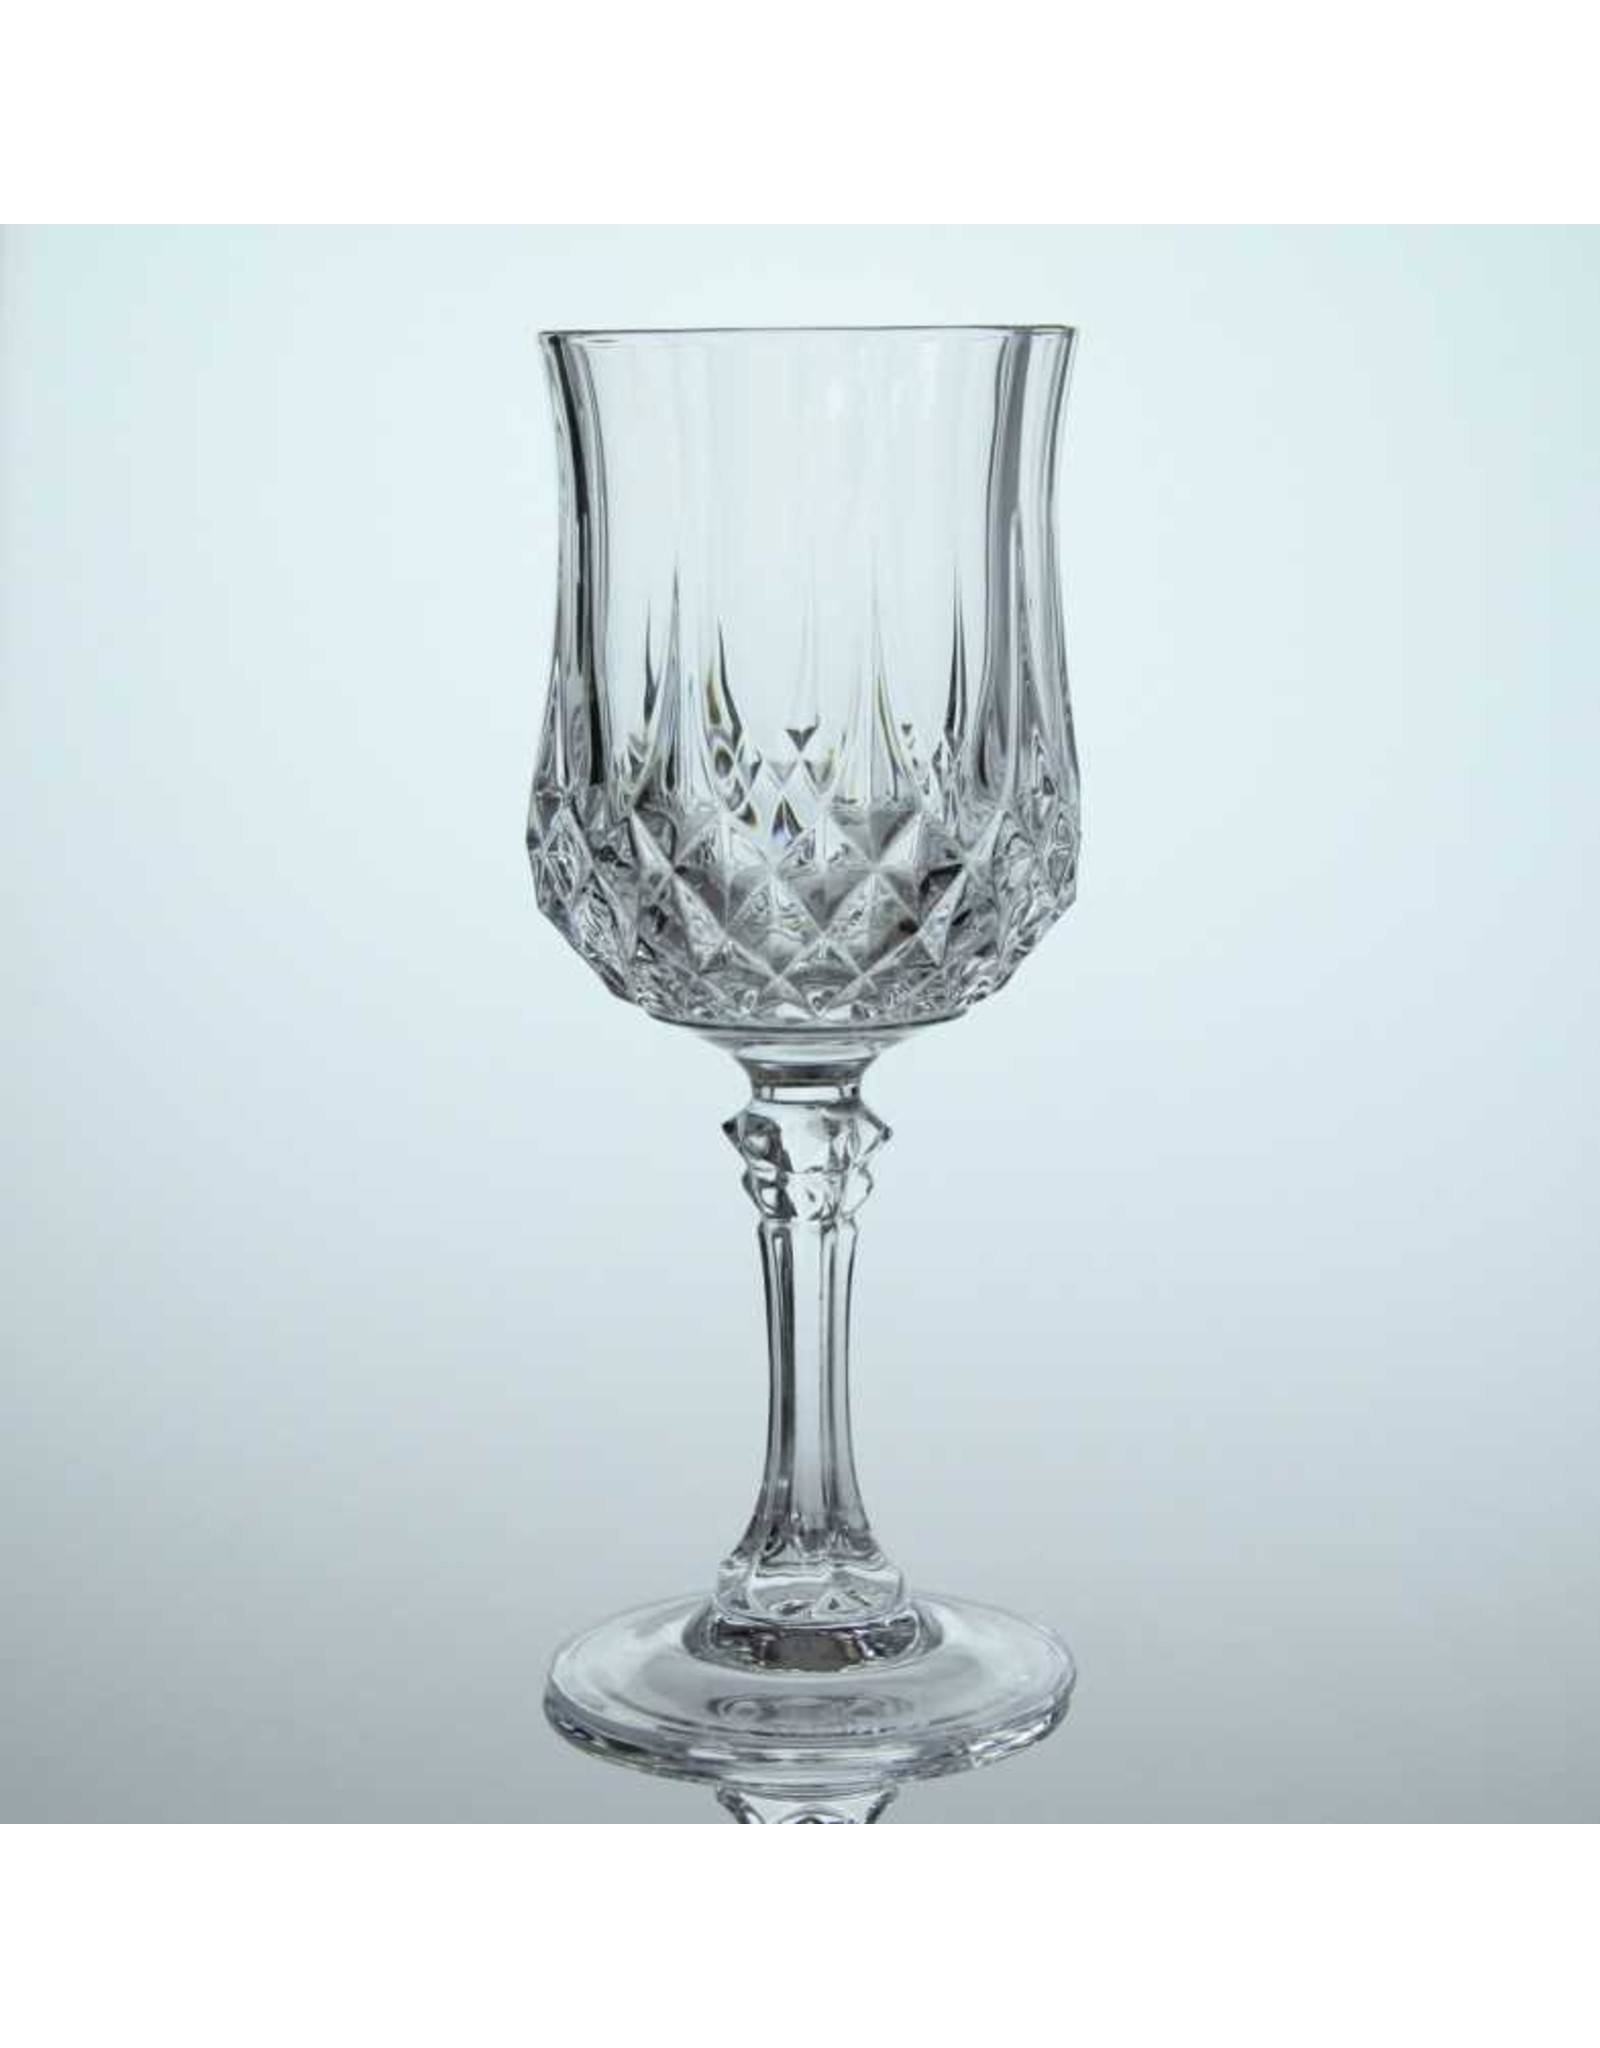 Wine glasses - pair, glass, diamond point